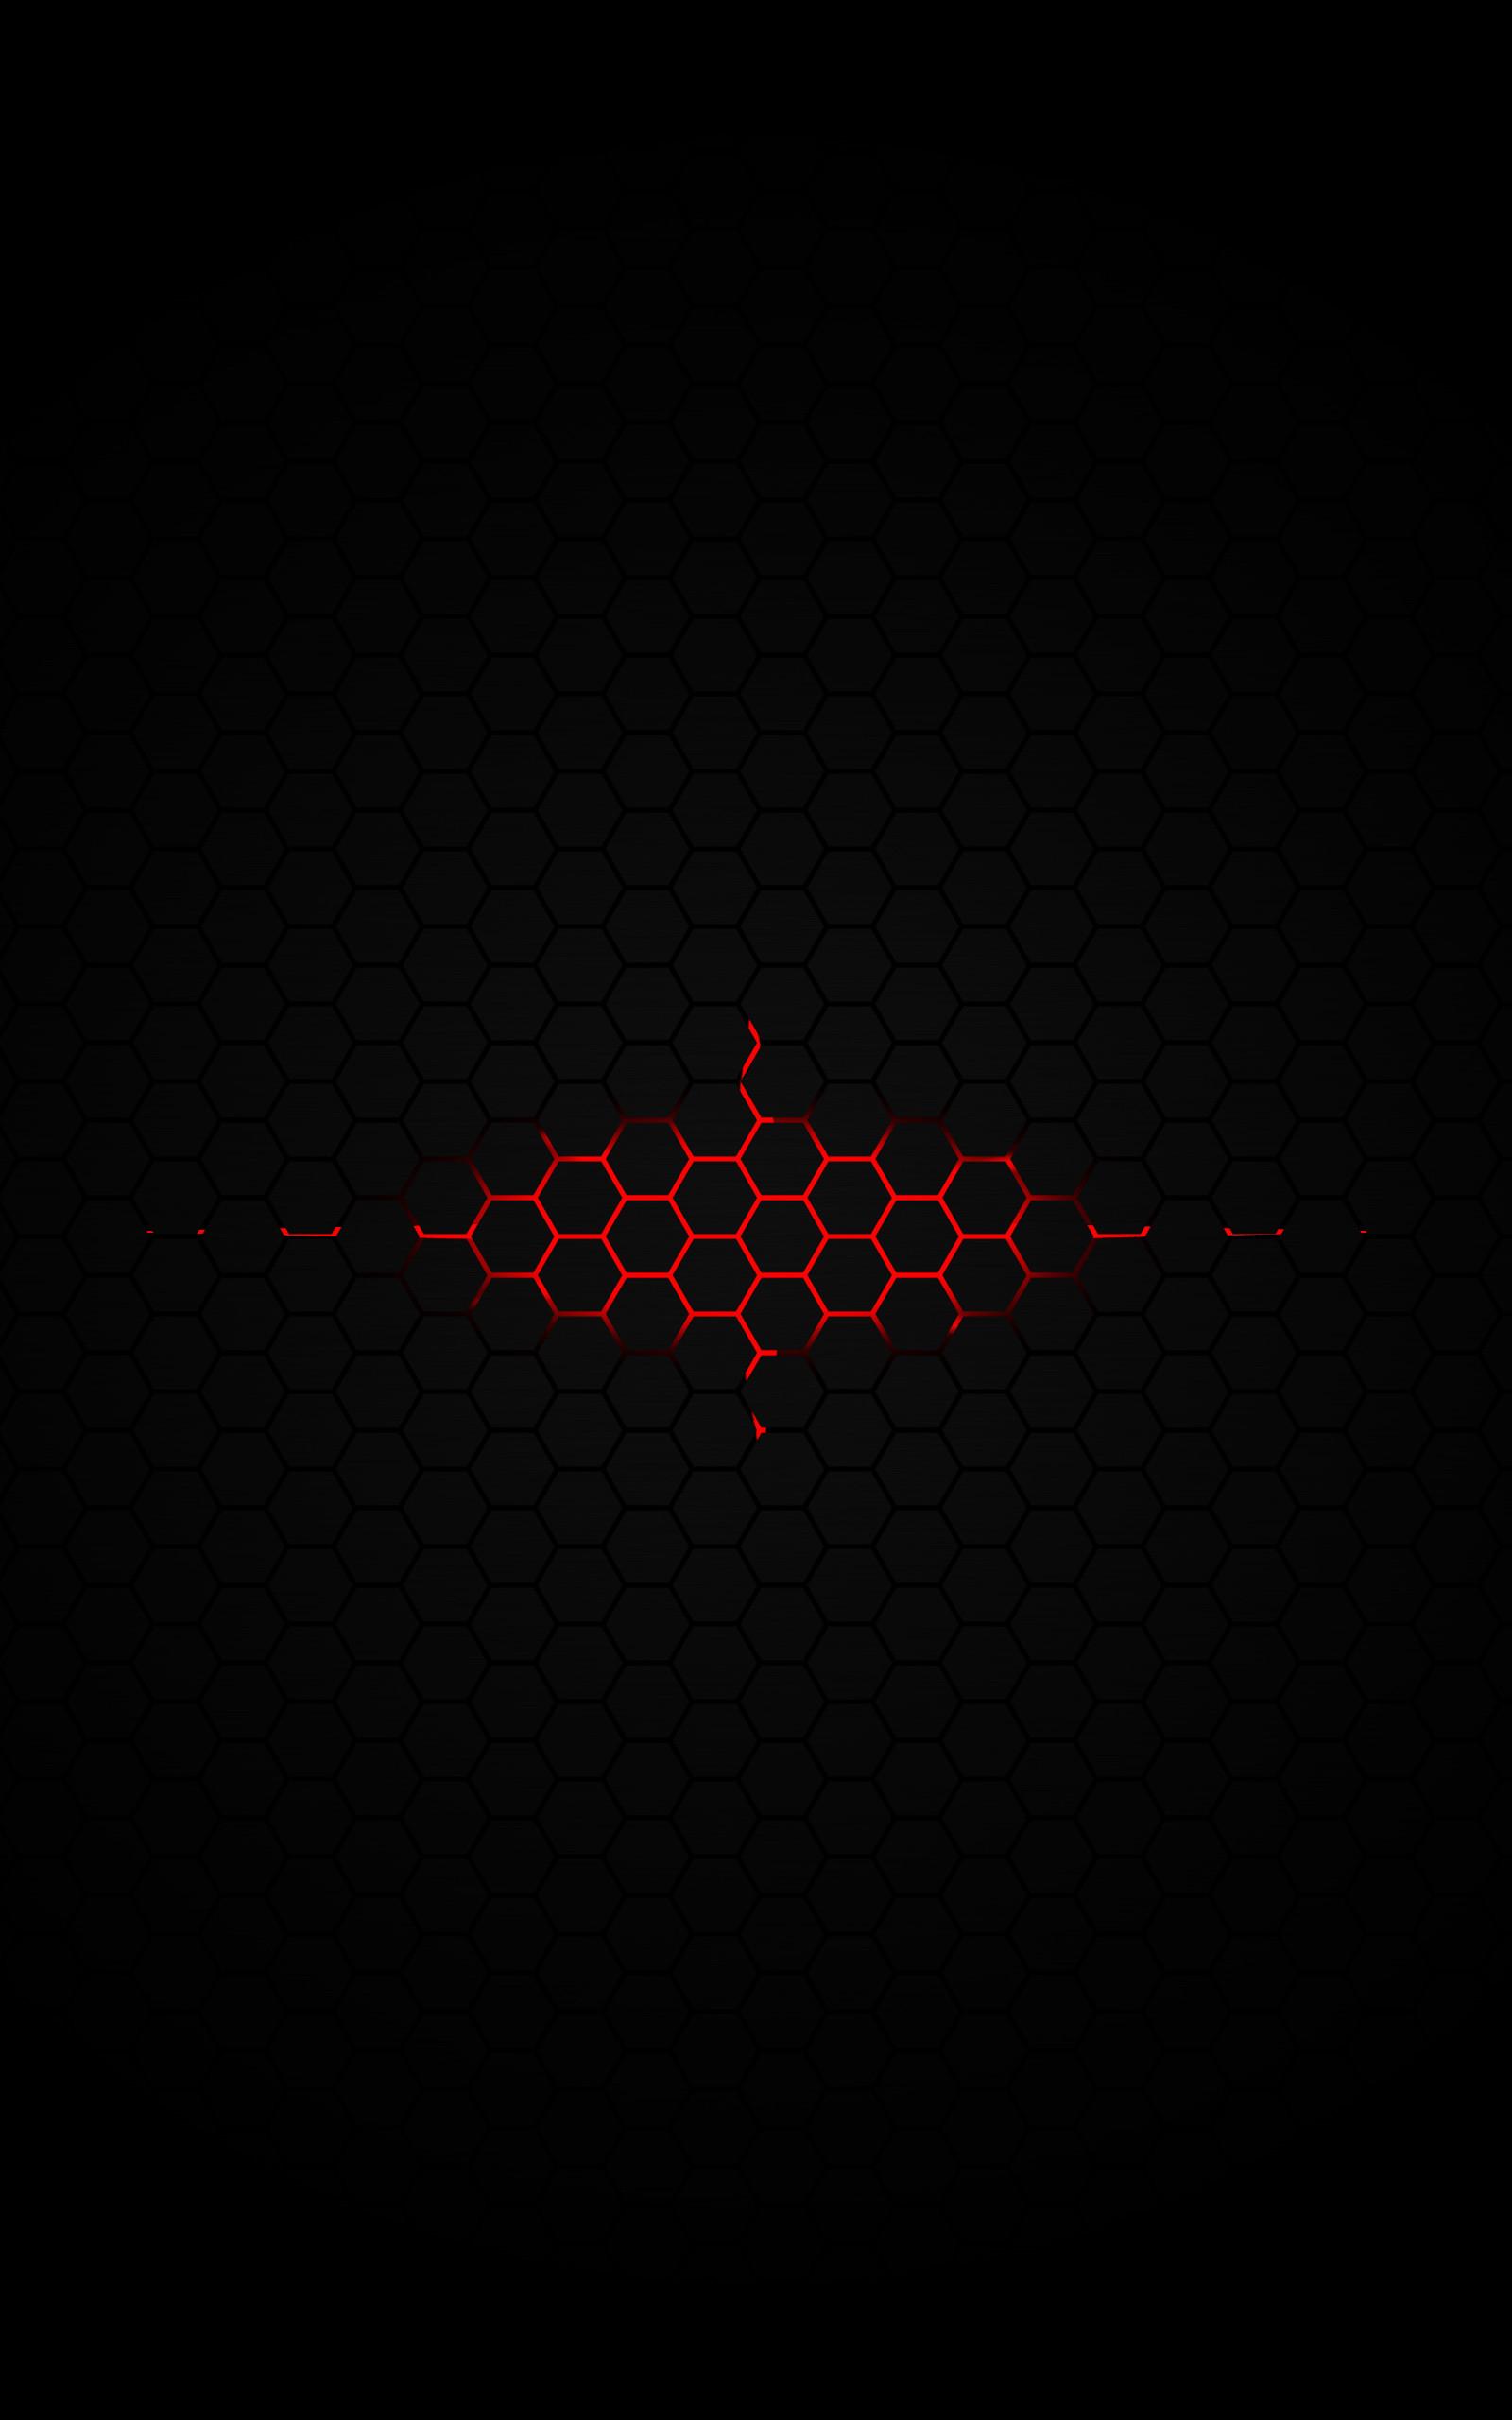 … Red glow under the hexagon pattern Digital Art mobile wallpaper